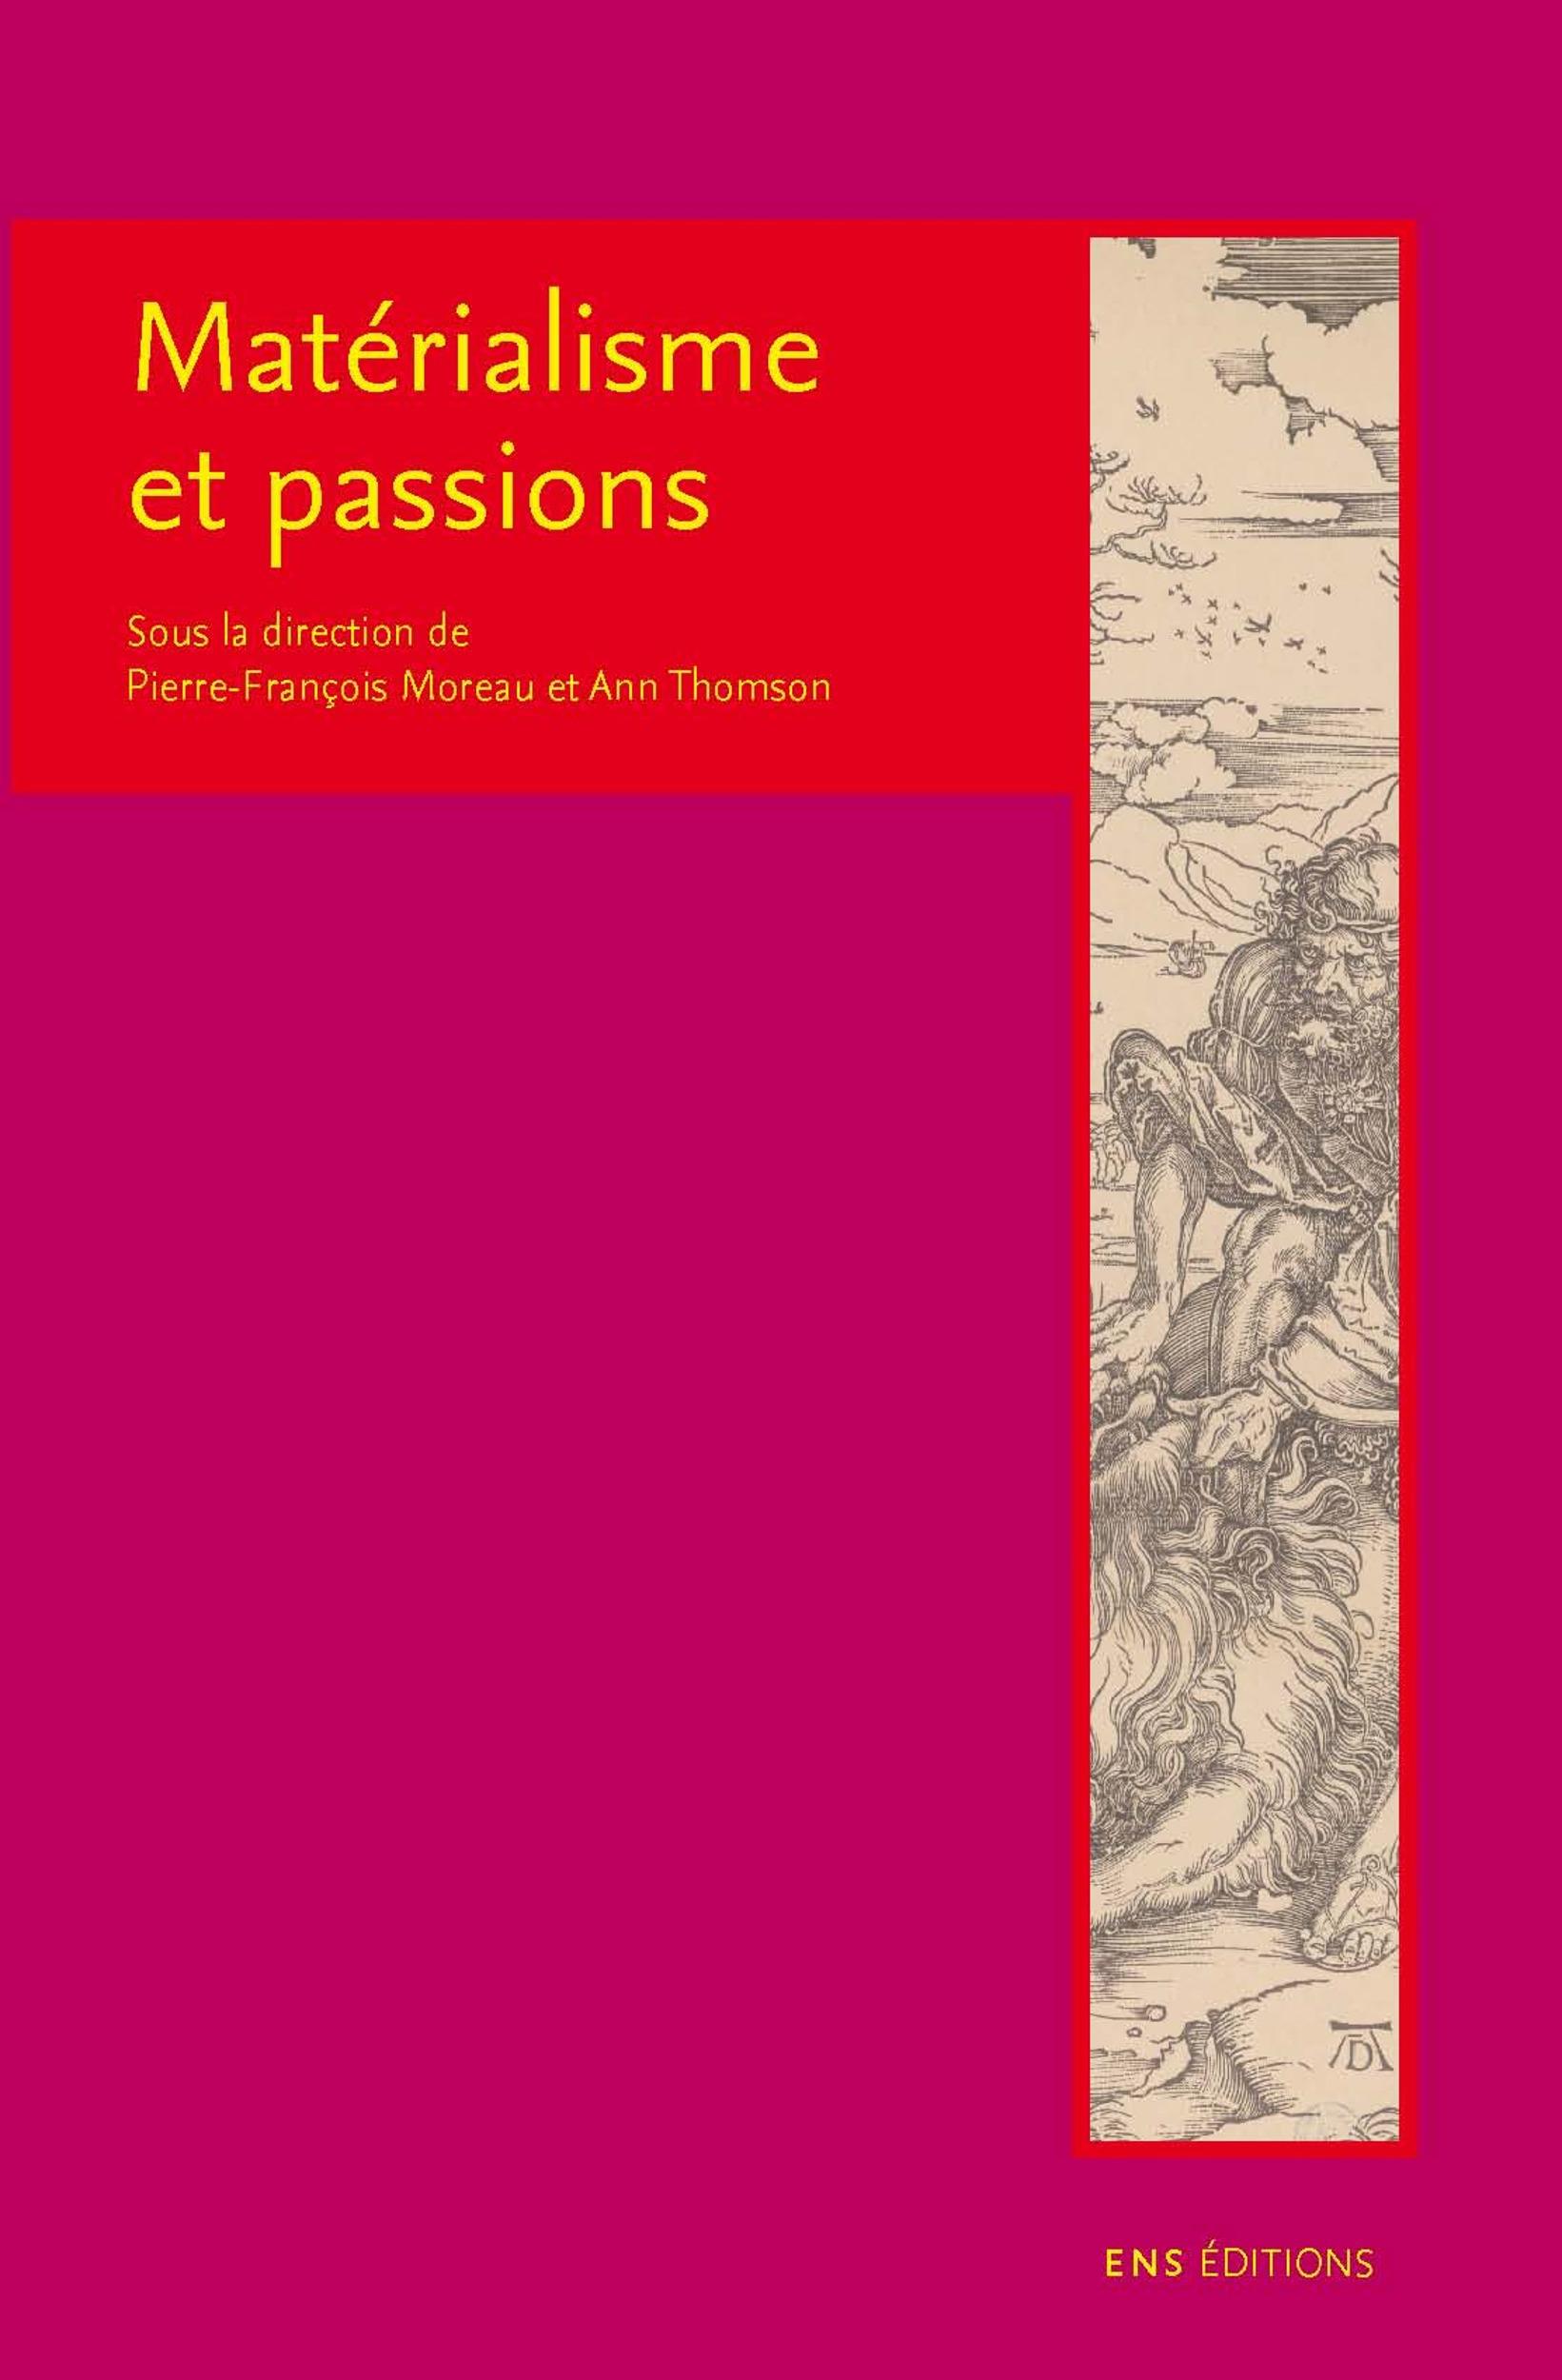 Materialisme et passions